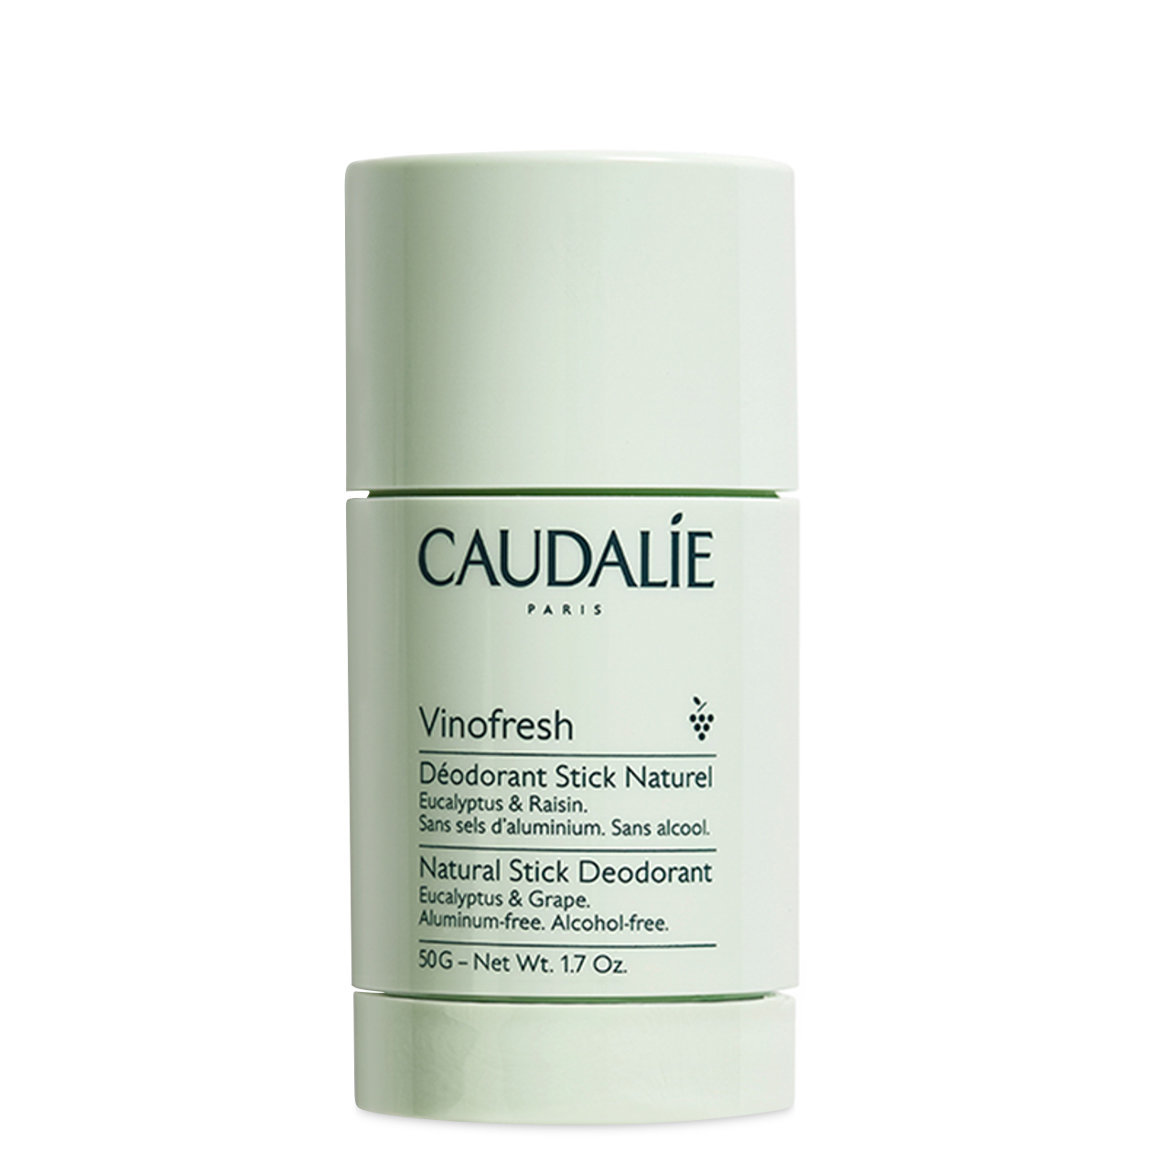 Caudalie Vinofresh Natural Aluminum-Free Deodorant alternative view 1 - product swatch.